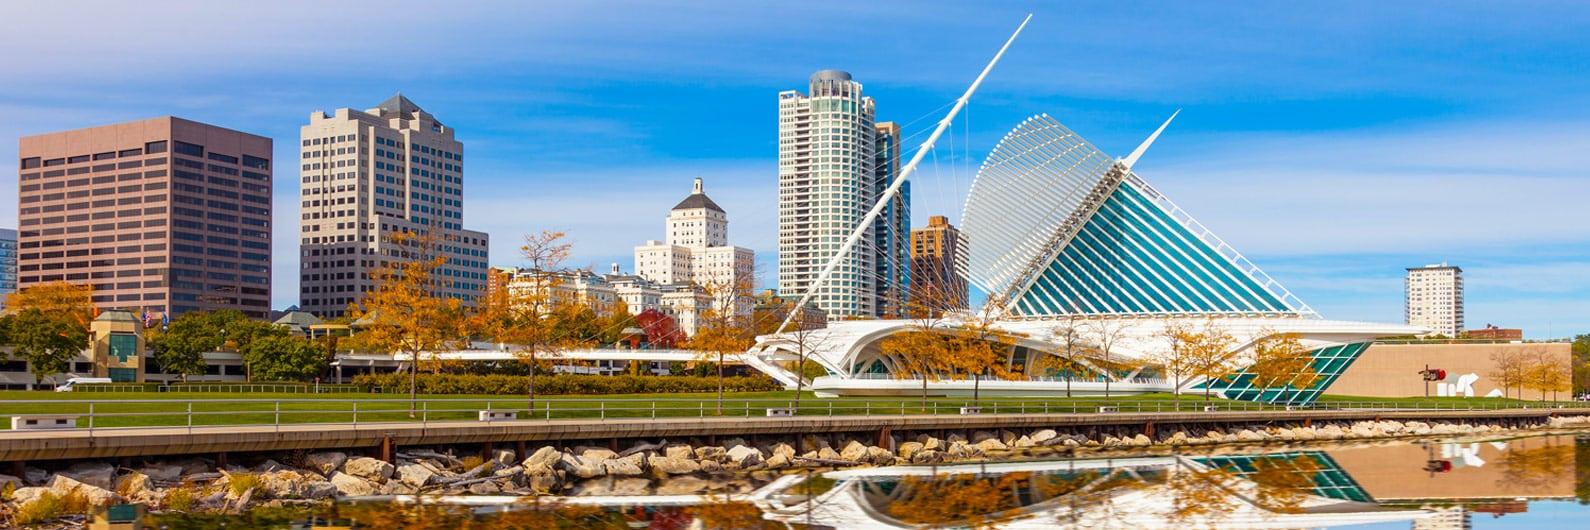 Mejores zonas donde alojarse en Milwaukee, Wisconsin